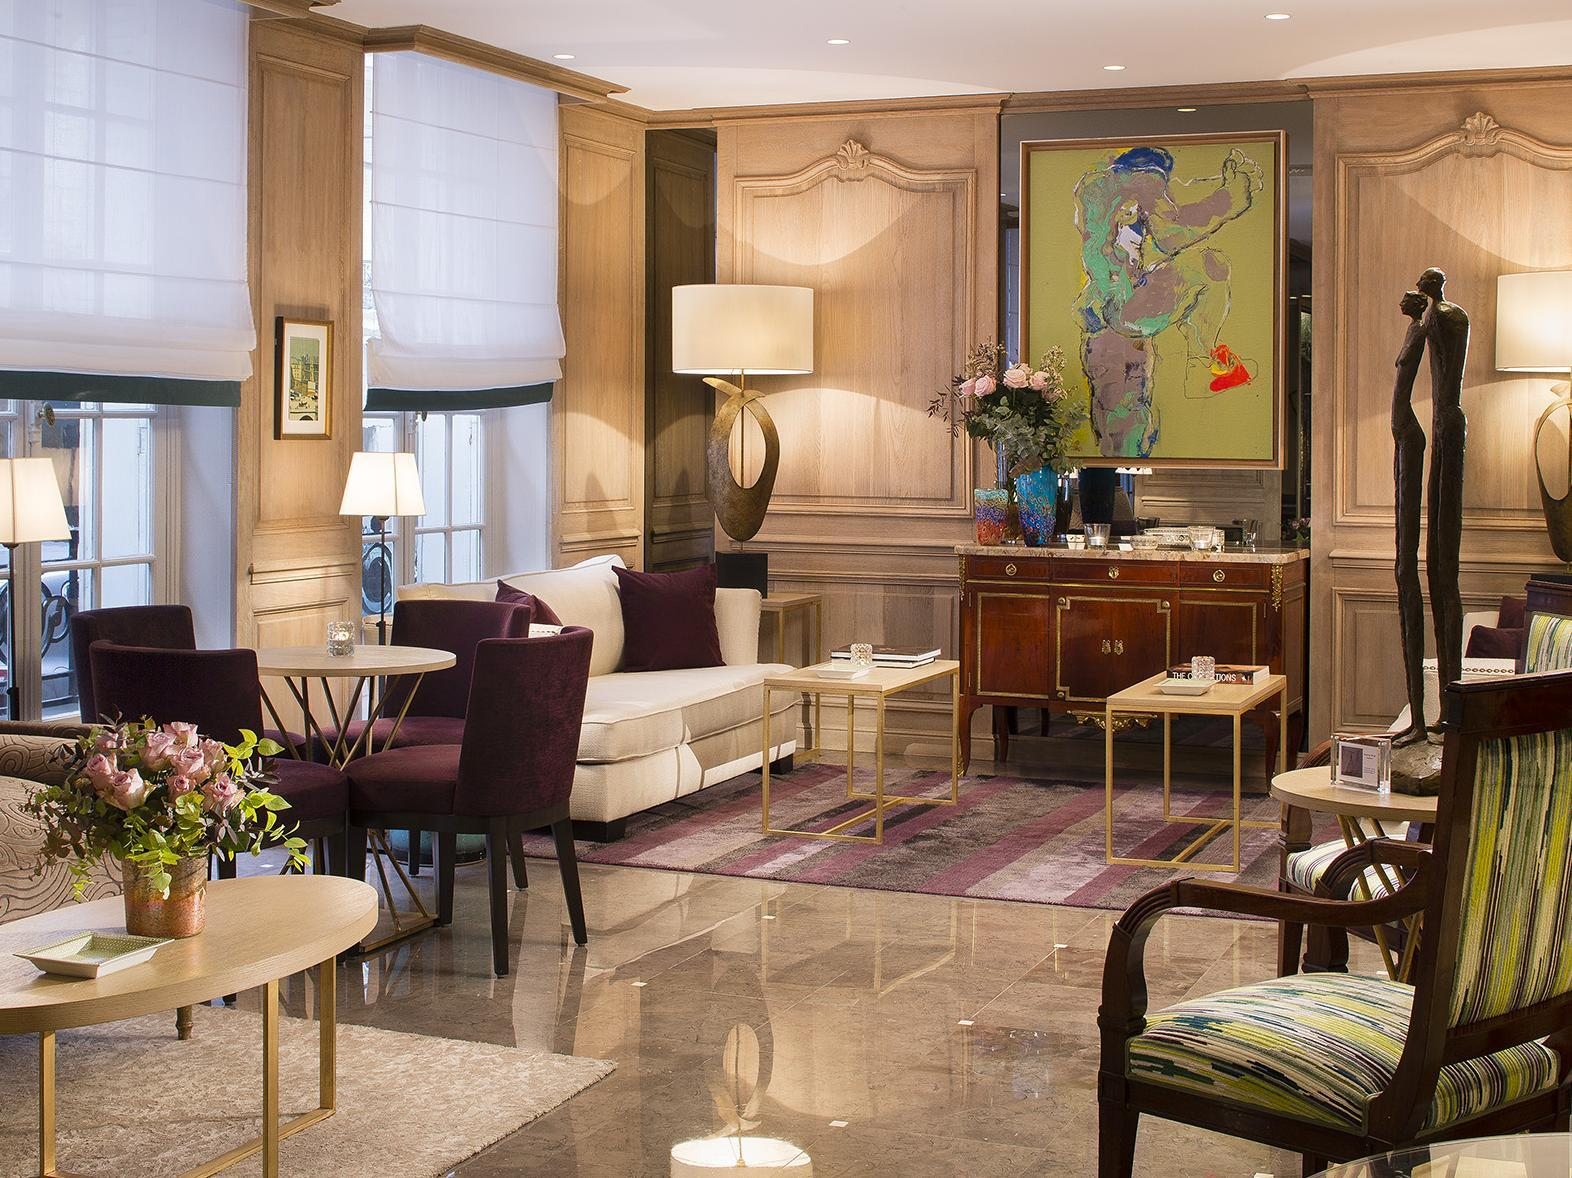 Hotel Balmoral Champs-Elysees - Hotell och Boende i Frankrike i Europa